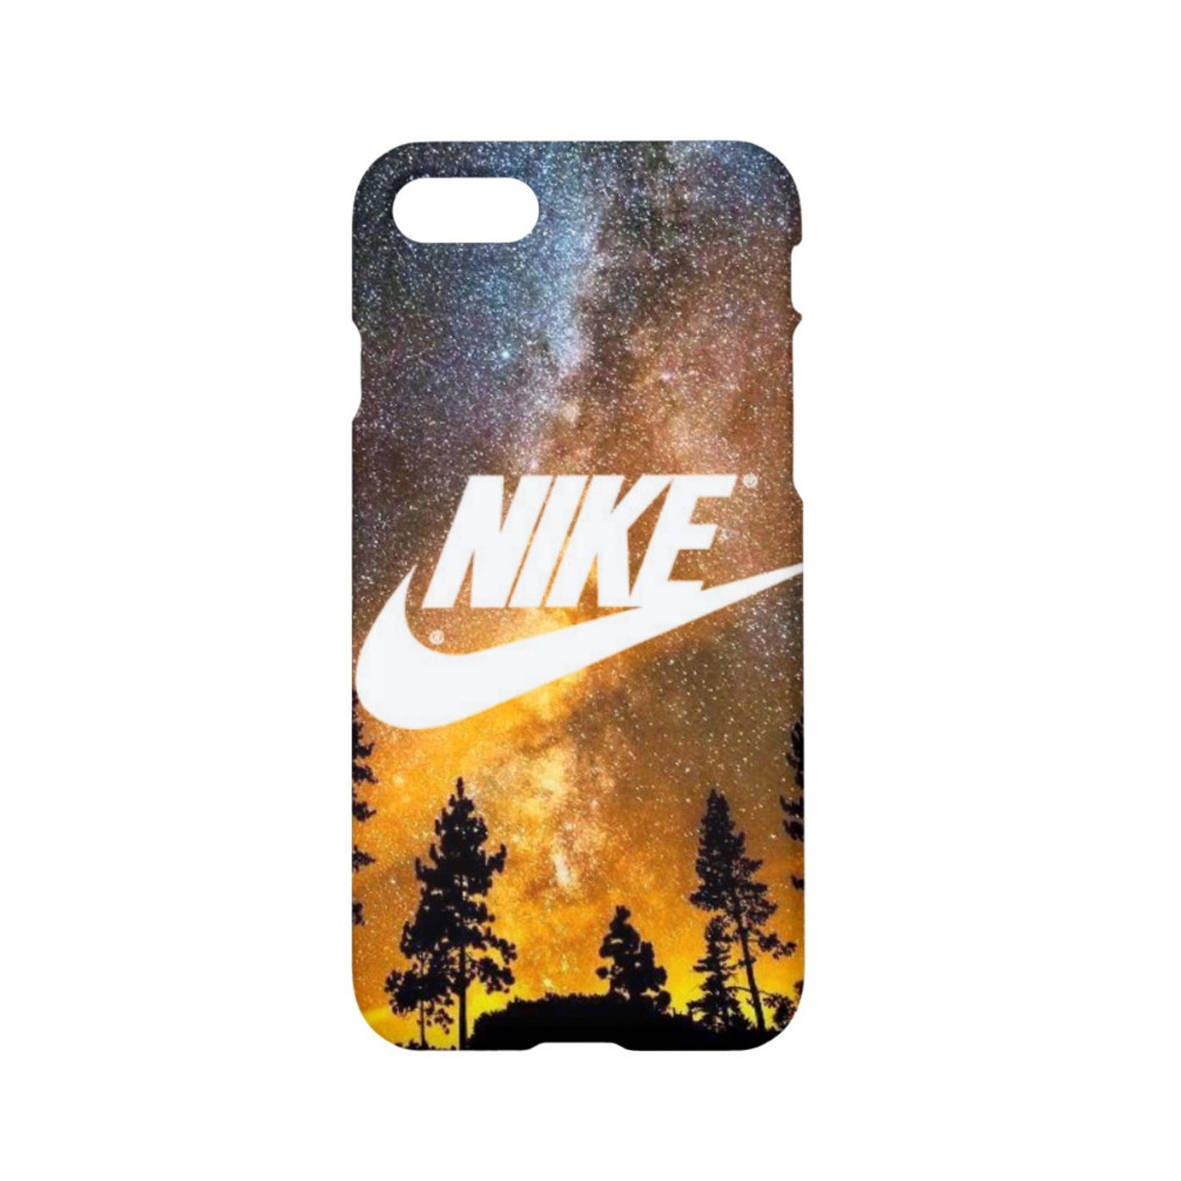 Phone Cases Custom Hardcase Midnight Dots Iphone 4 5 5c 6 Plus 7 Case Nike 6s